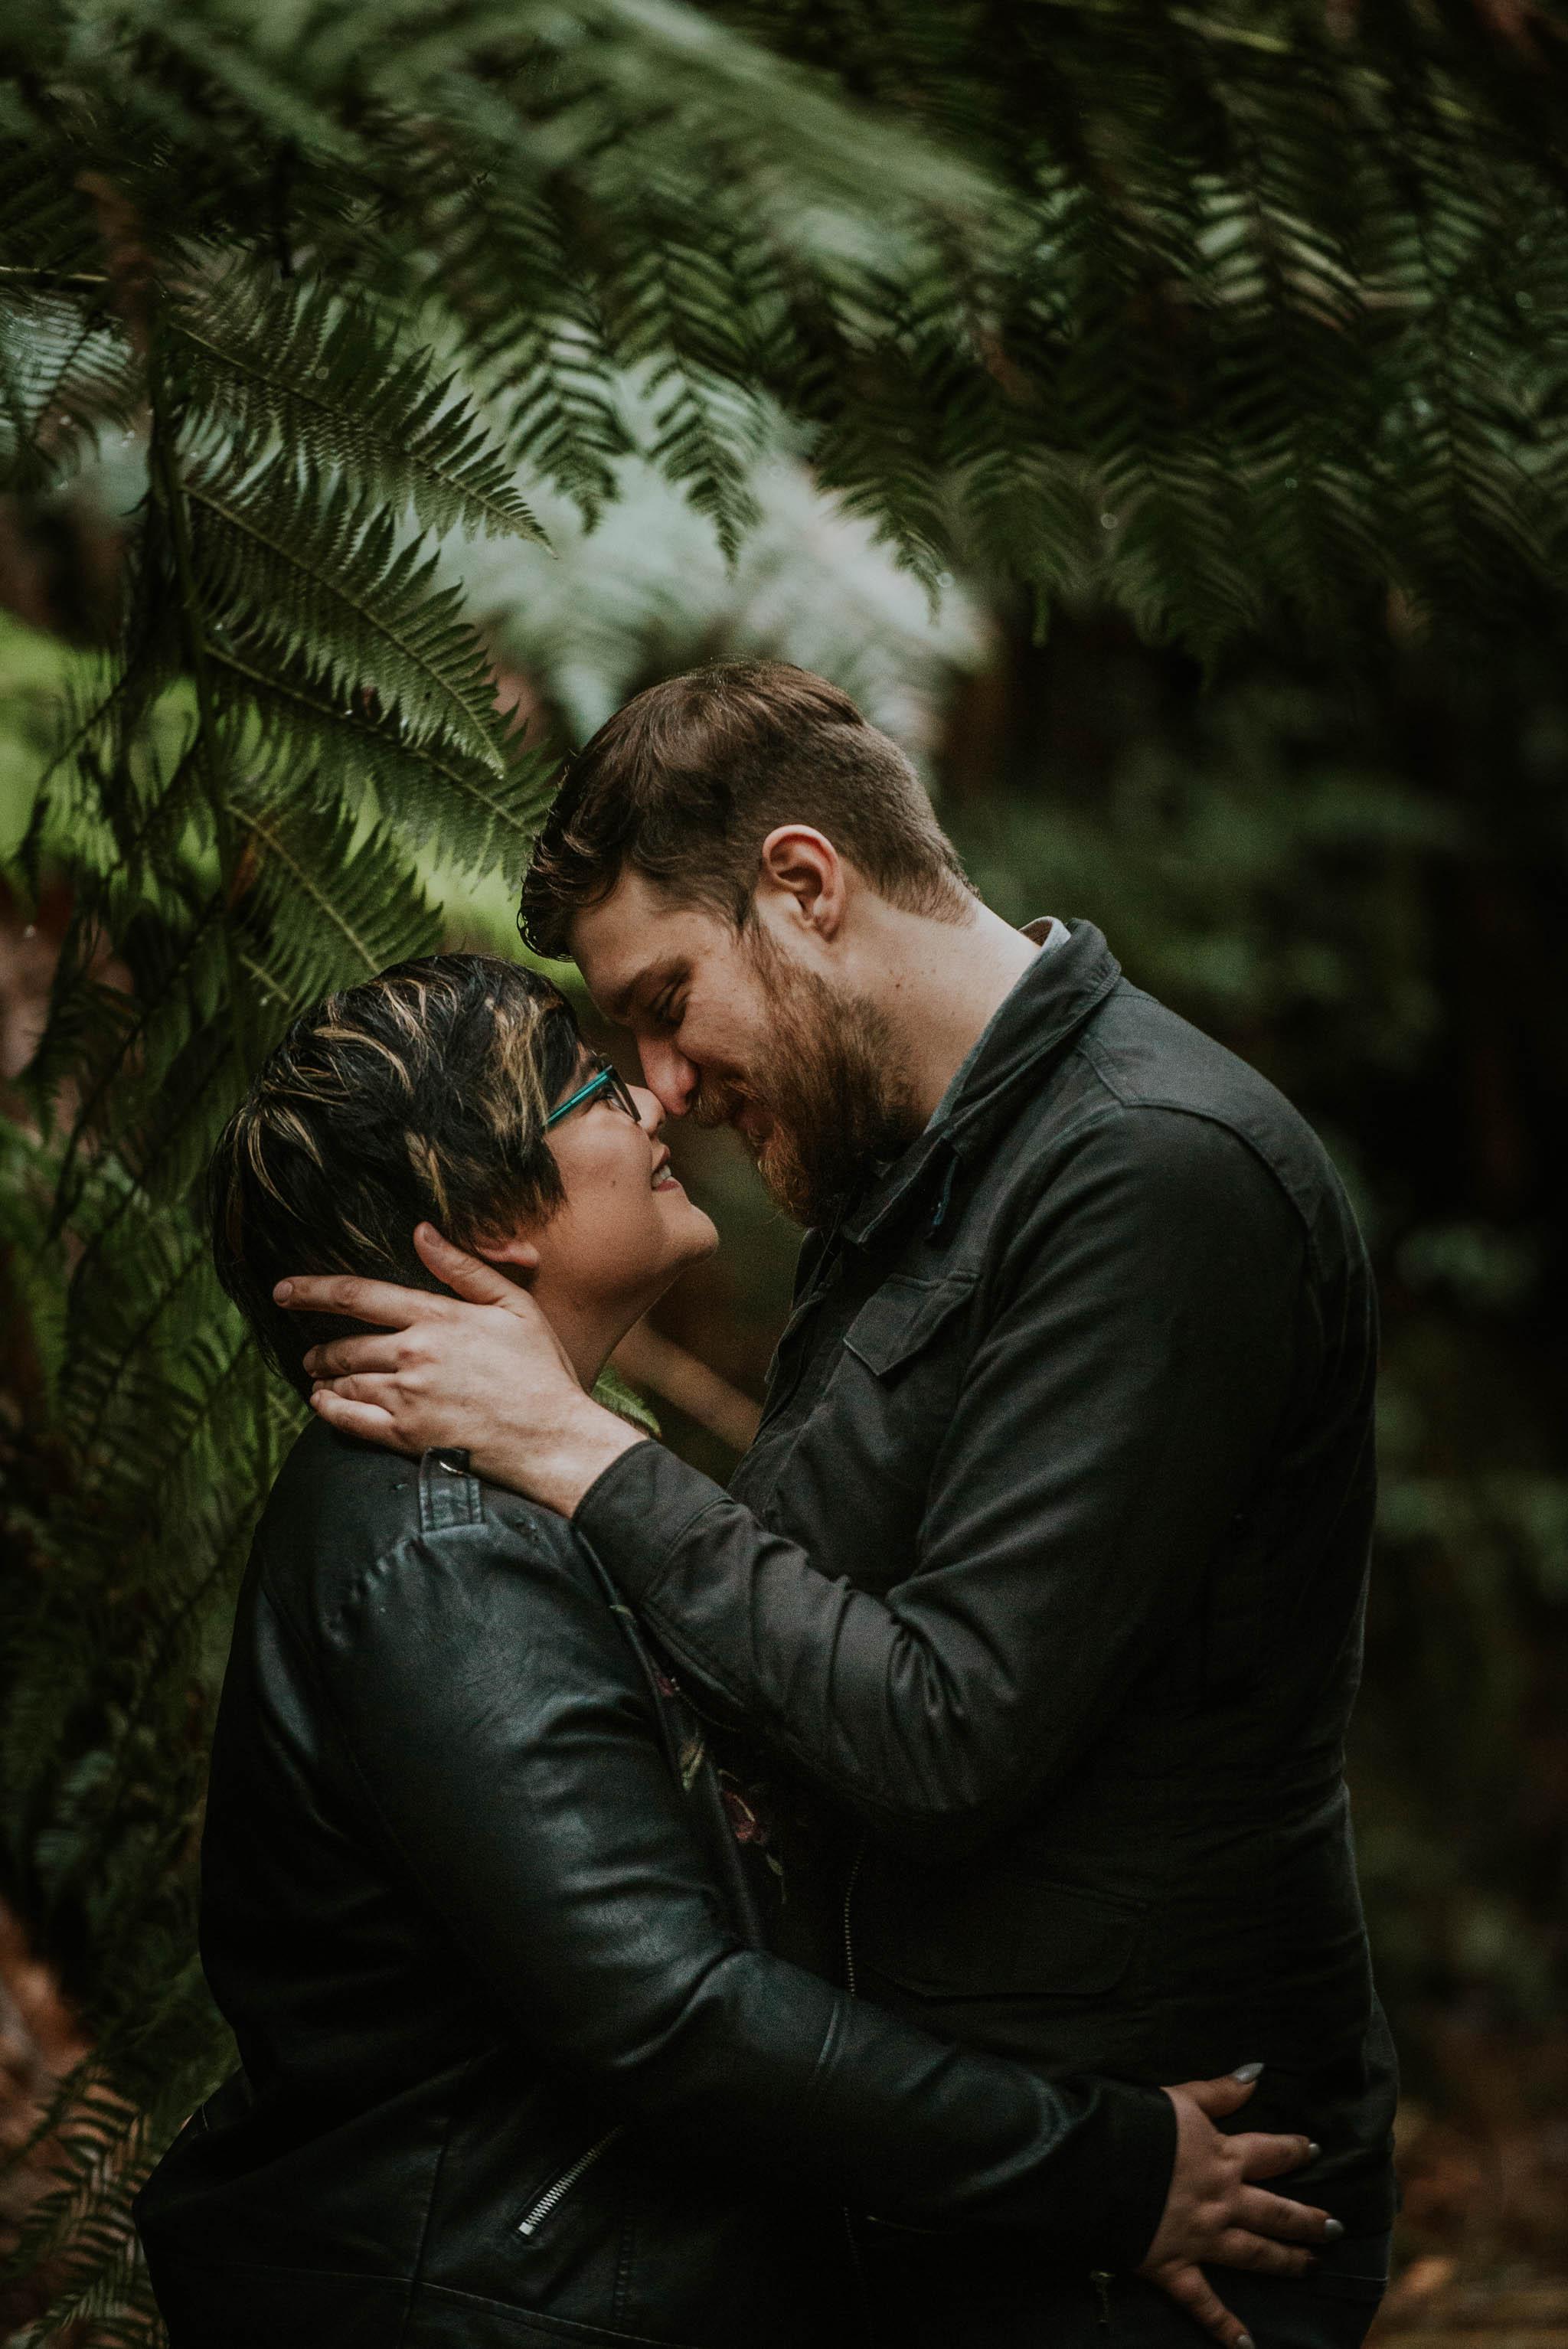 launceston couples photographer-6.jpg